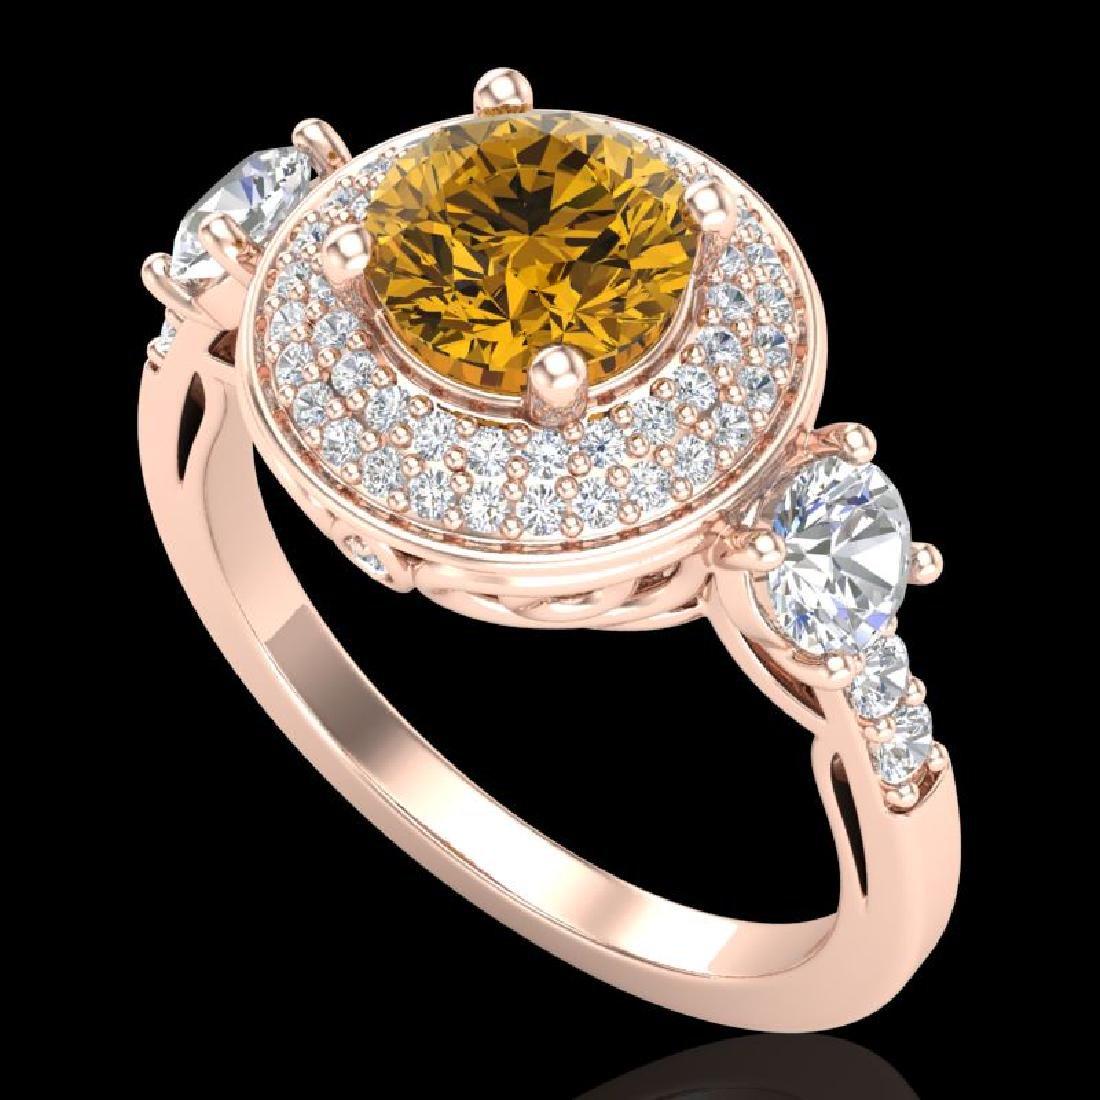 2.05 CTW Intense Fancy Yellow Diamond Art Deco 3 Stone